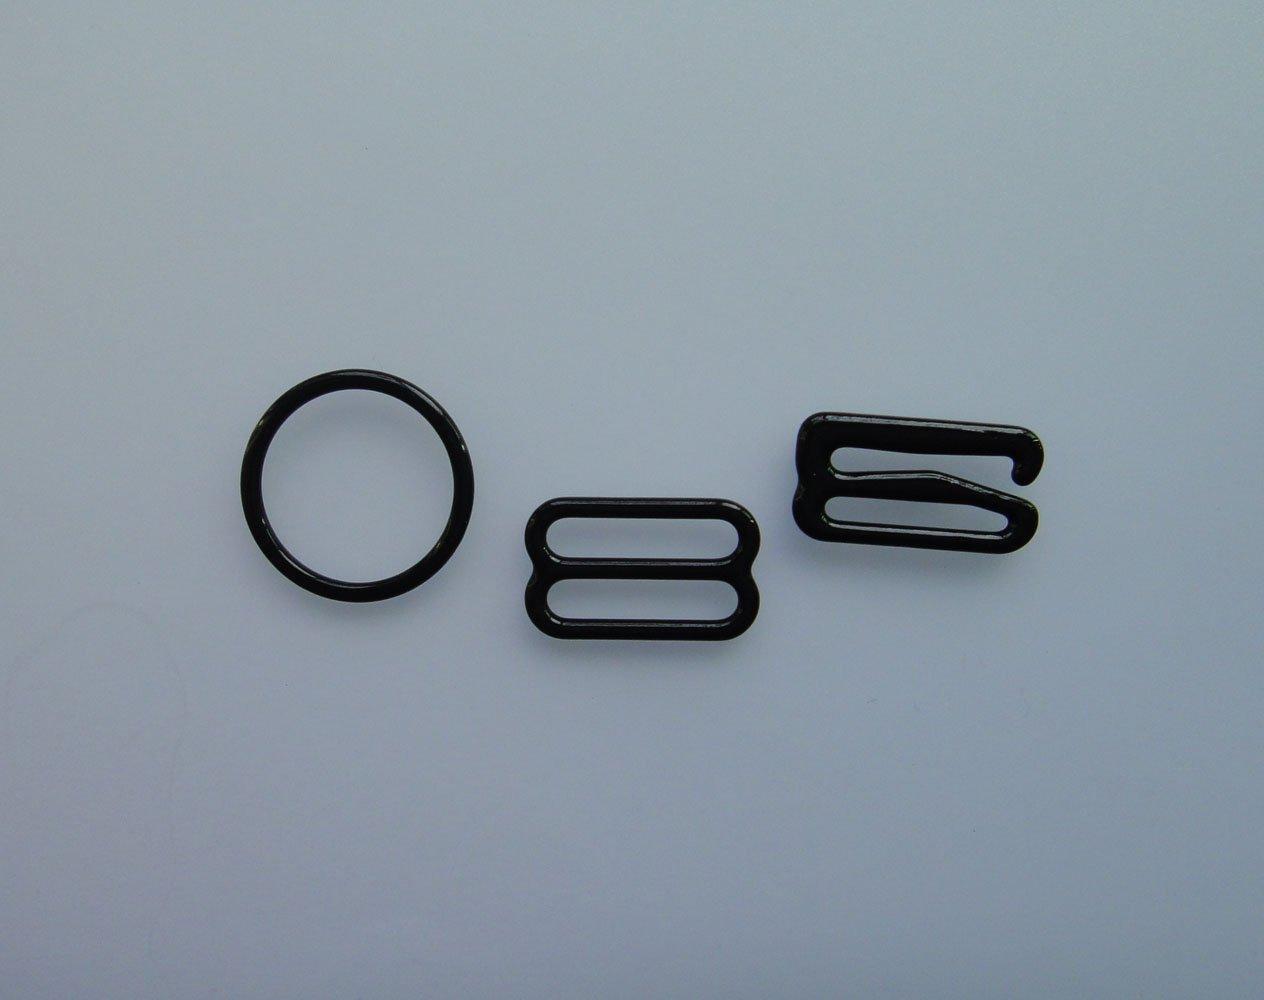 Lyracces 100pcs Nylon Coated Metal Bra Lingerie Adjustment Strap Slides Rings Rectangular Figure Adjustor 8 0 Hooks Hoops Clasp 9 25mm 0.98, White